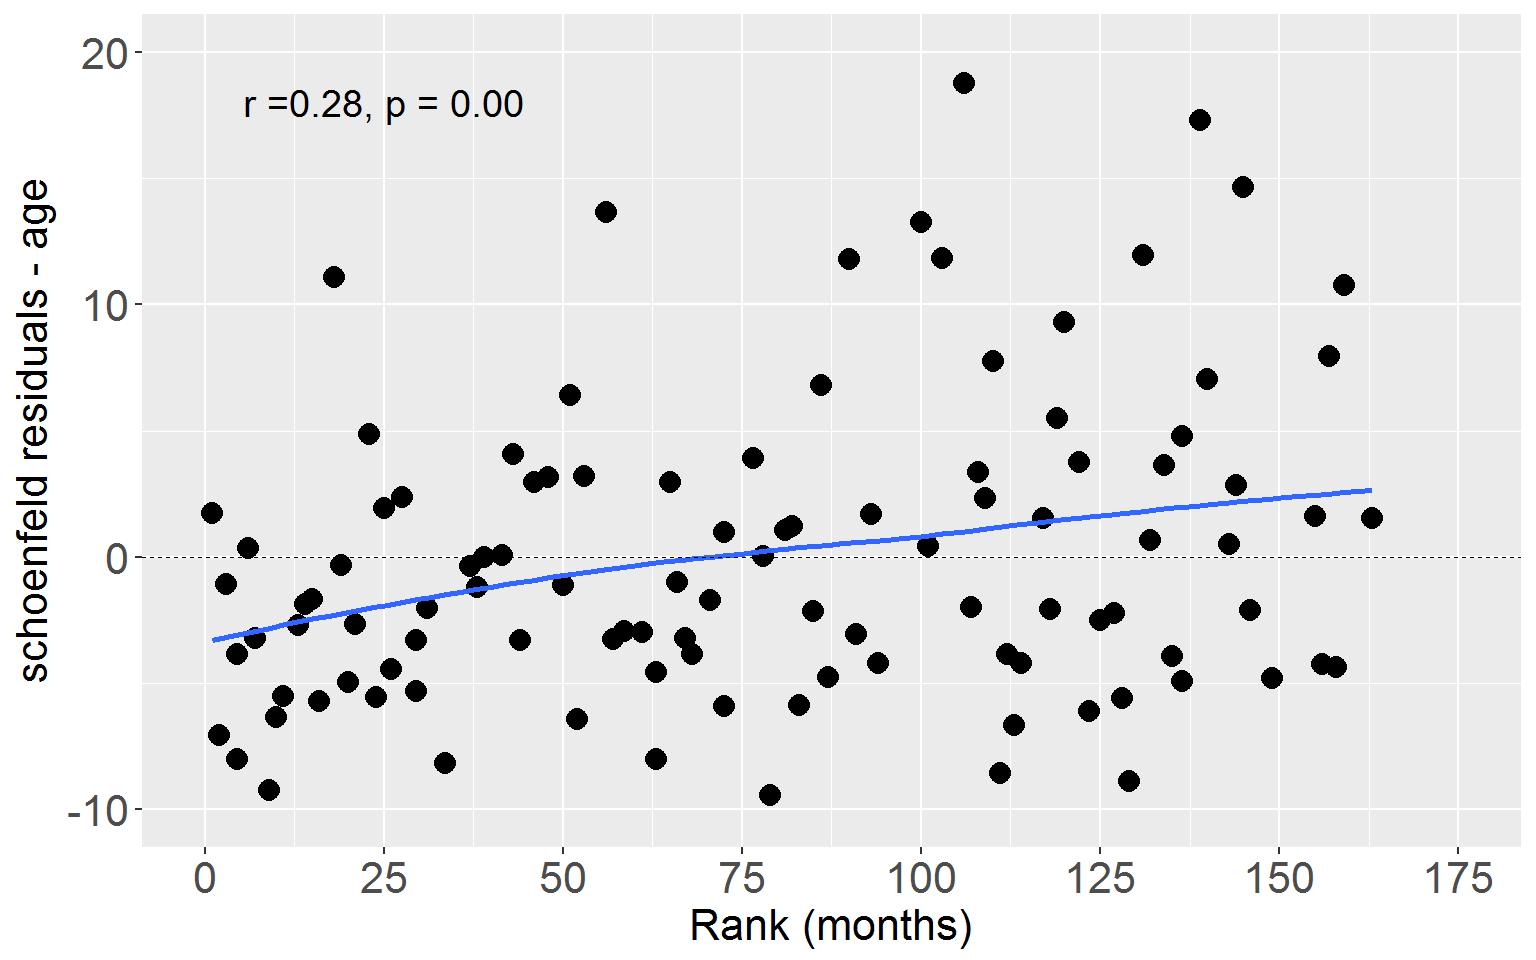 Image ch15_Figure-15.5-schoenfeld-residuals-plot-age-1